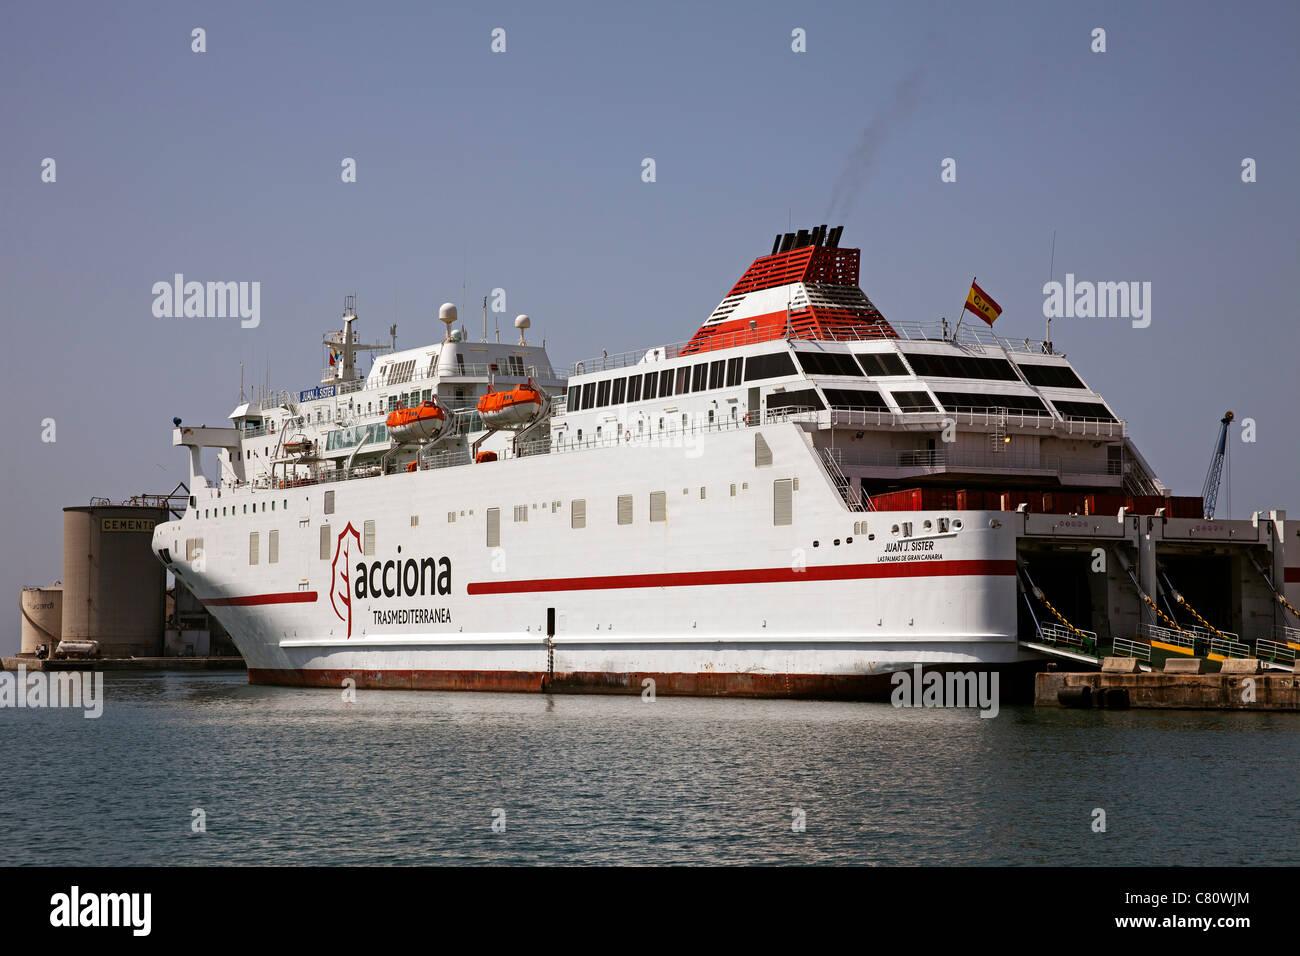 Passenger ship at the port of Malaga Costa del Sol Andalusia Spain - Stock Image